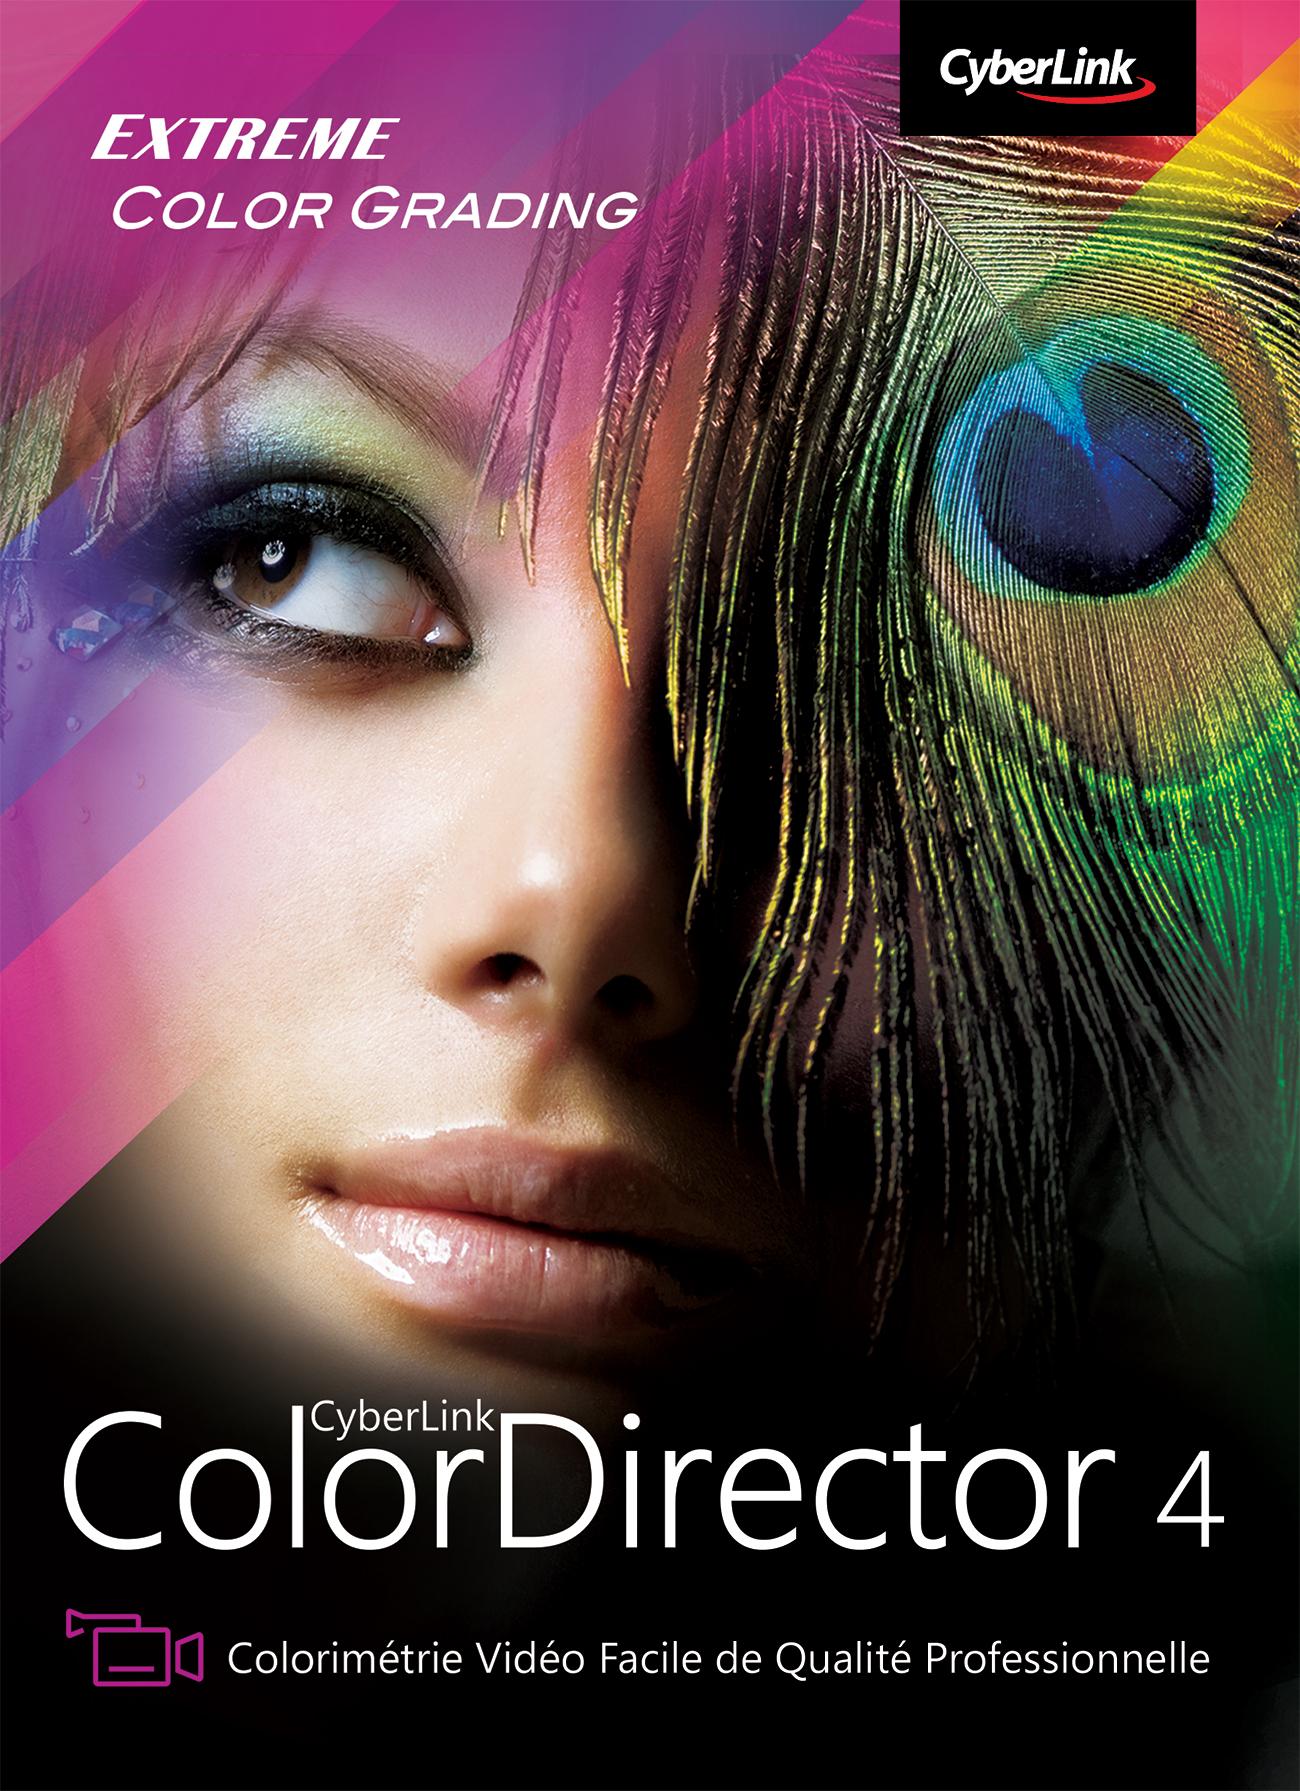 cyberlink-colordirector-4-telechargement